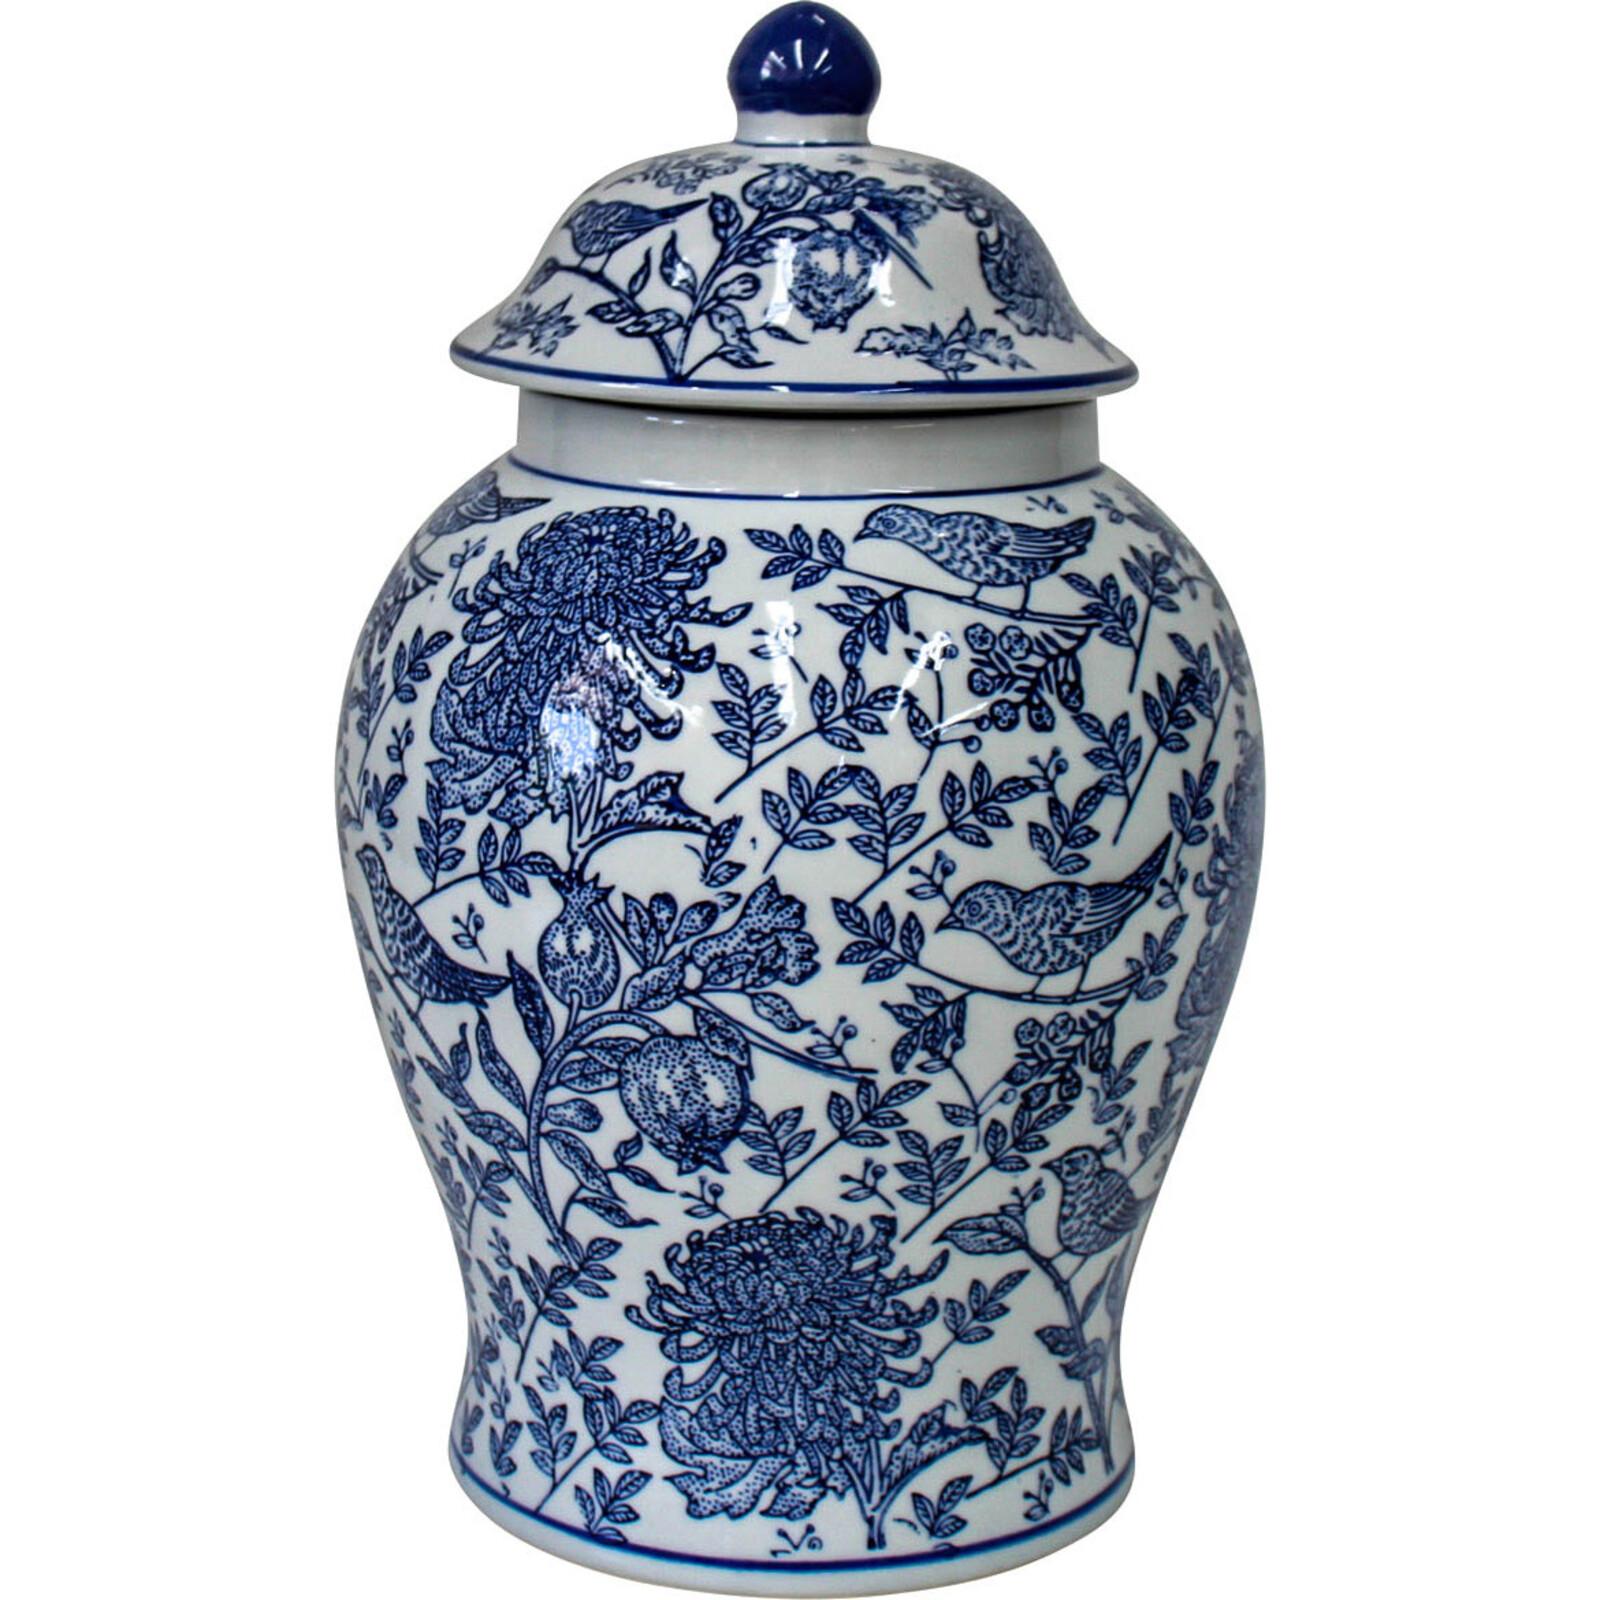 # Ginger Jar Blue Bird/Pomegranate